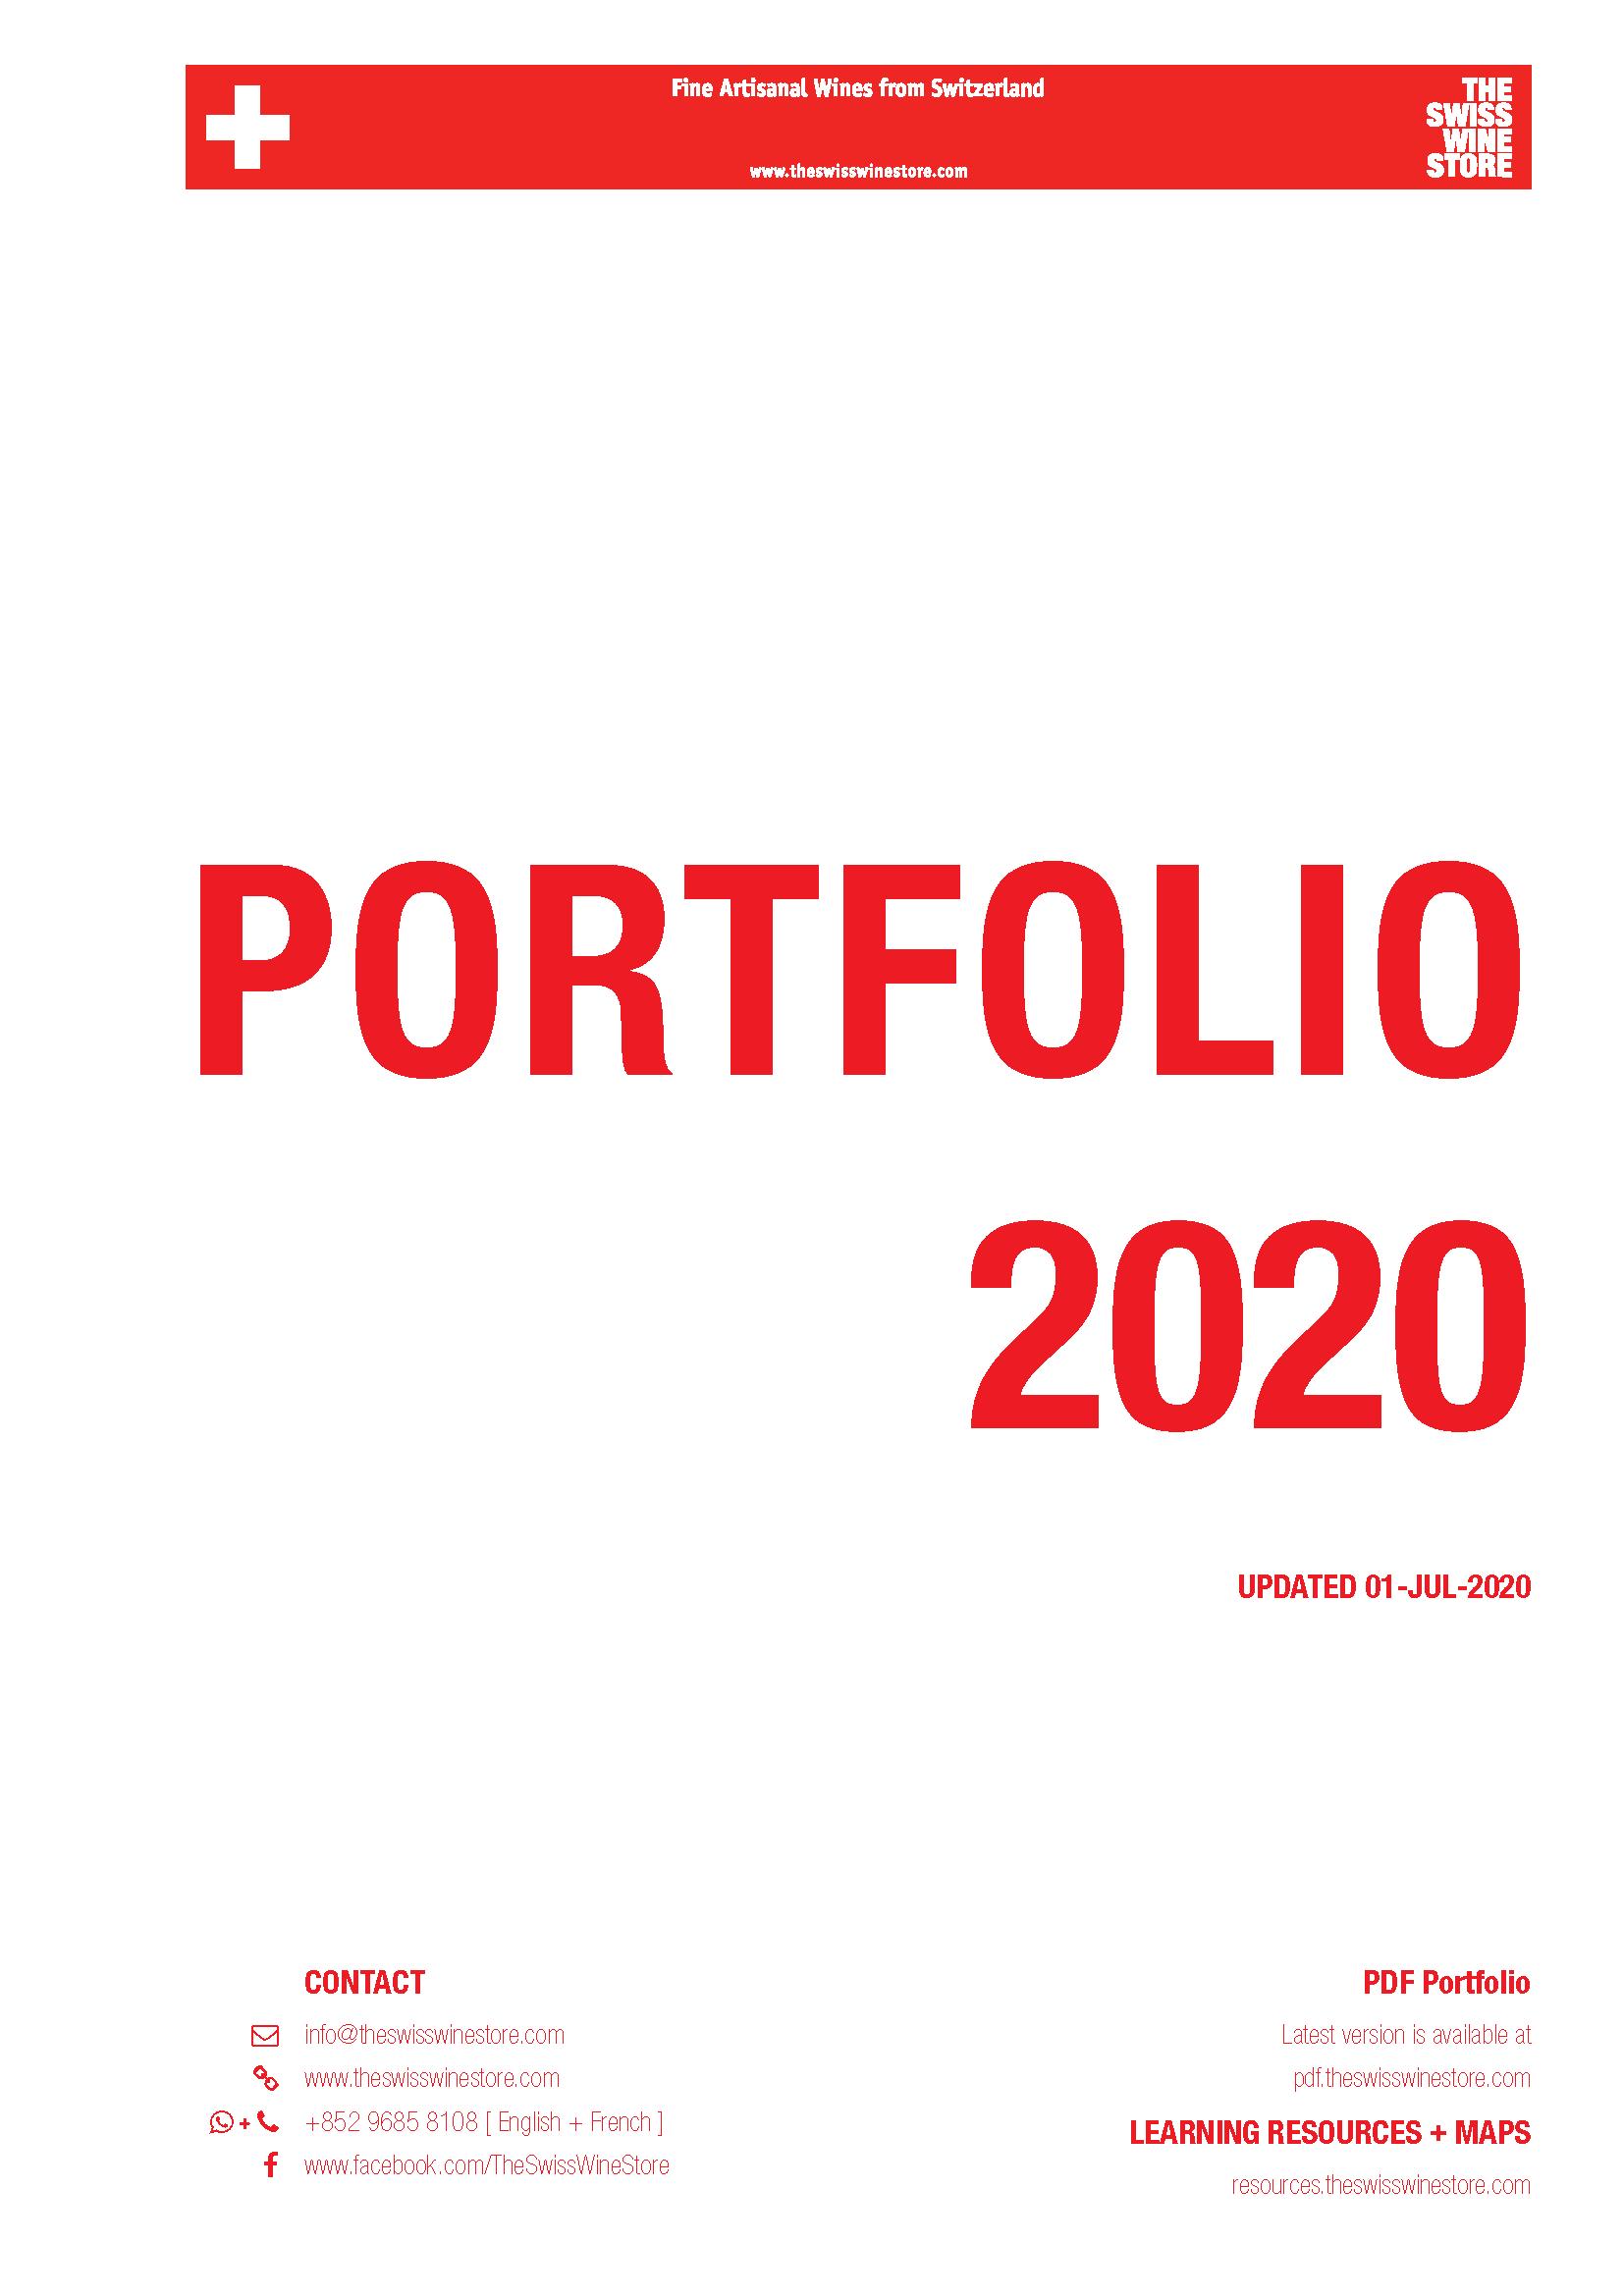 tsws_wine_portfolio_A4_2020-03.png